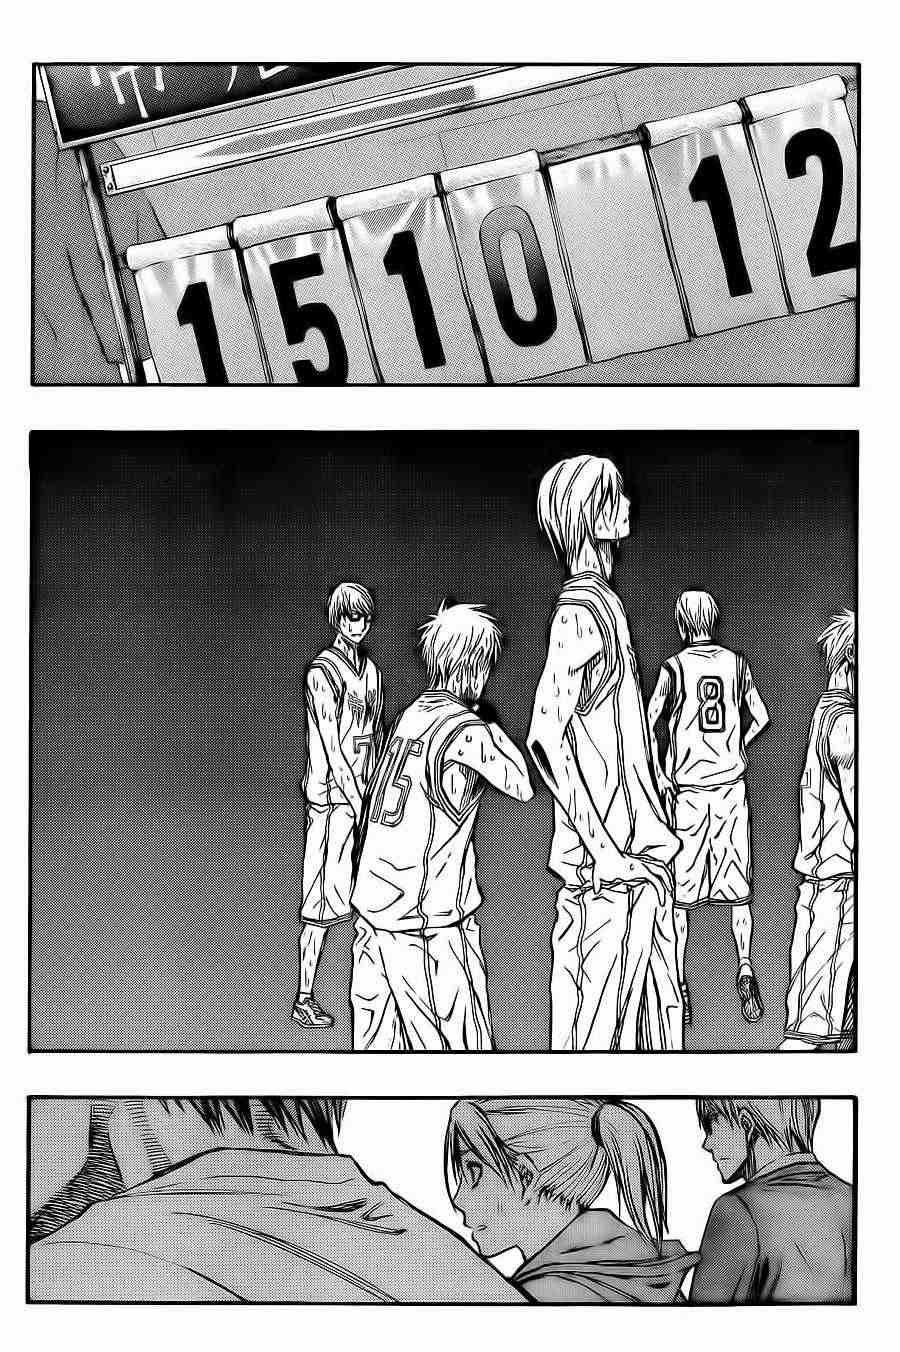 Kuroko no Basket Manga Chapter 223 - Image 10